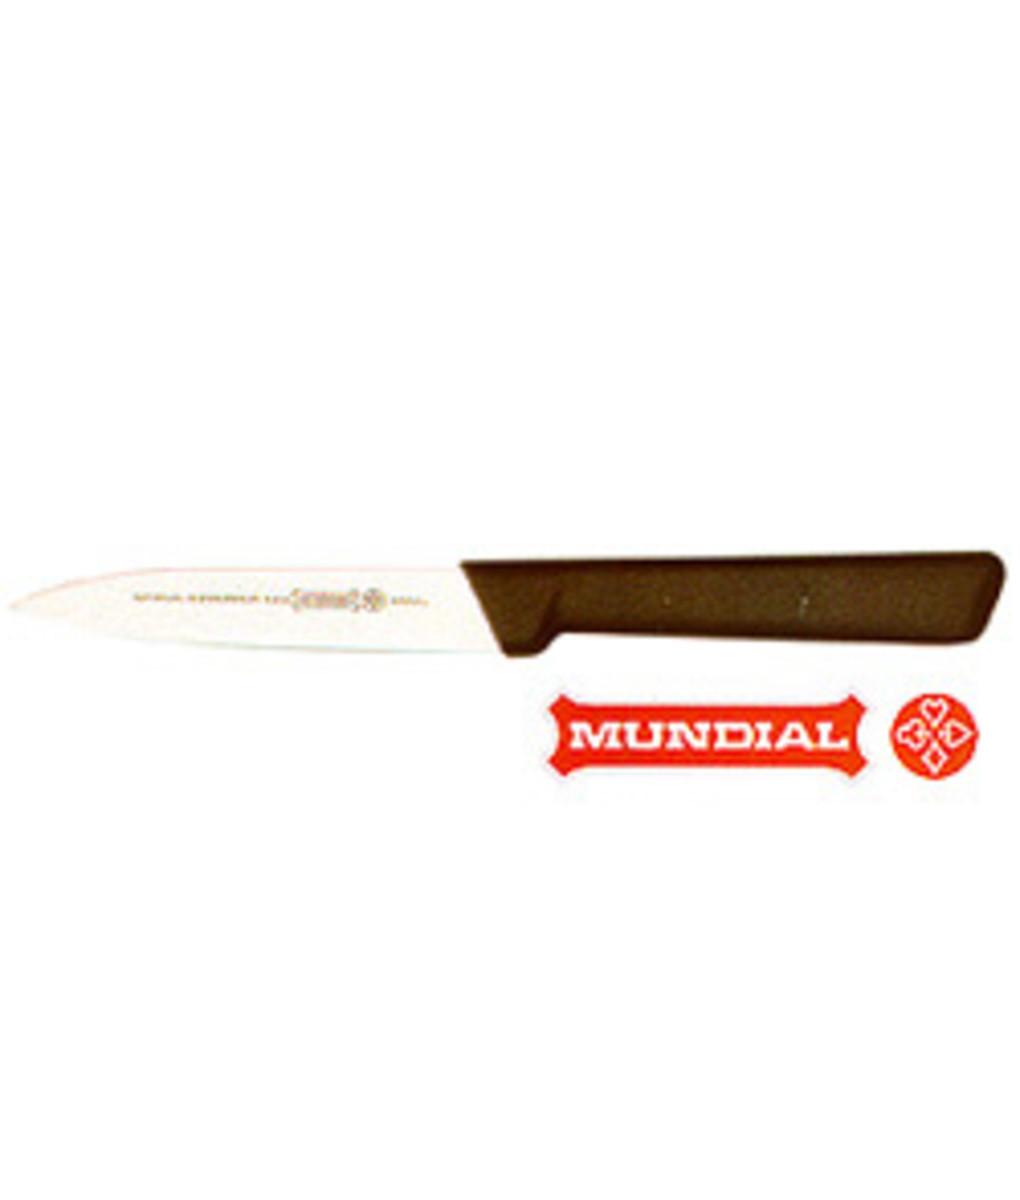 Mundial Paring Knife Lwt 10cm